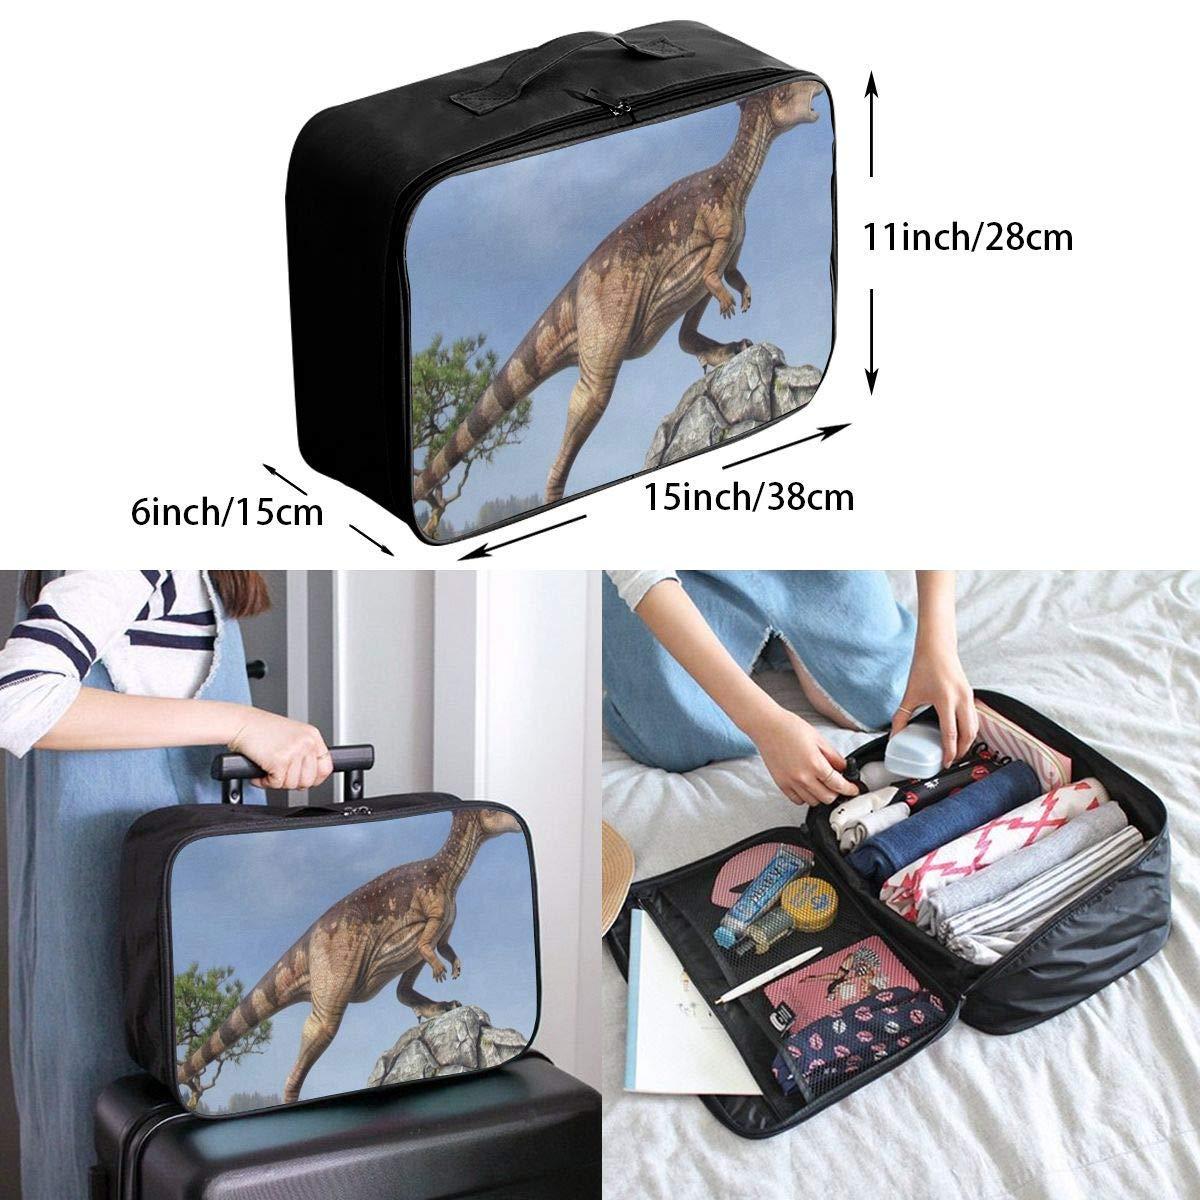 Travel Bags Dinosaur Tree Rocks Sky Portable Suitcase Trolley Handle Luggage Bag